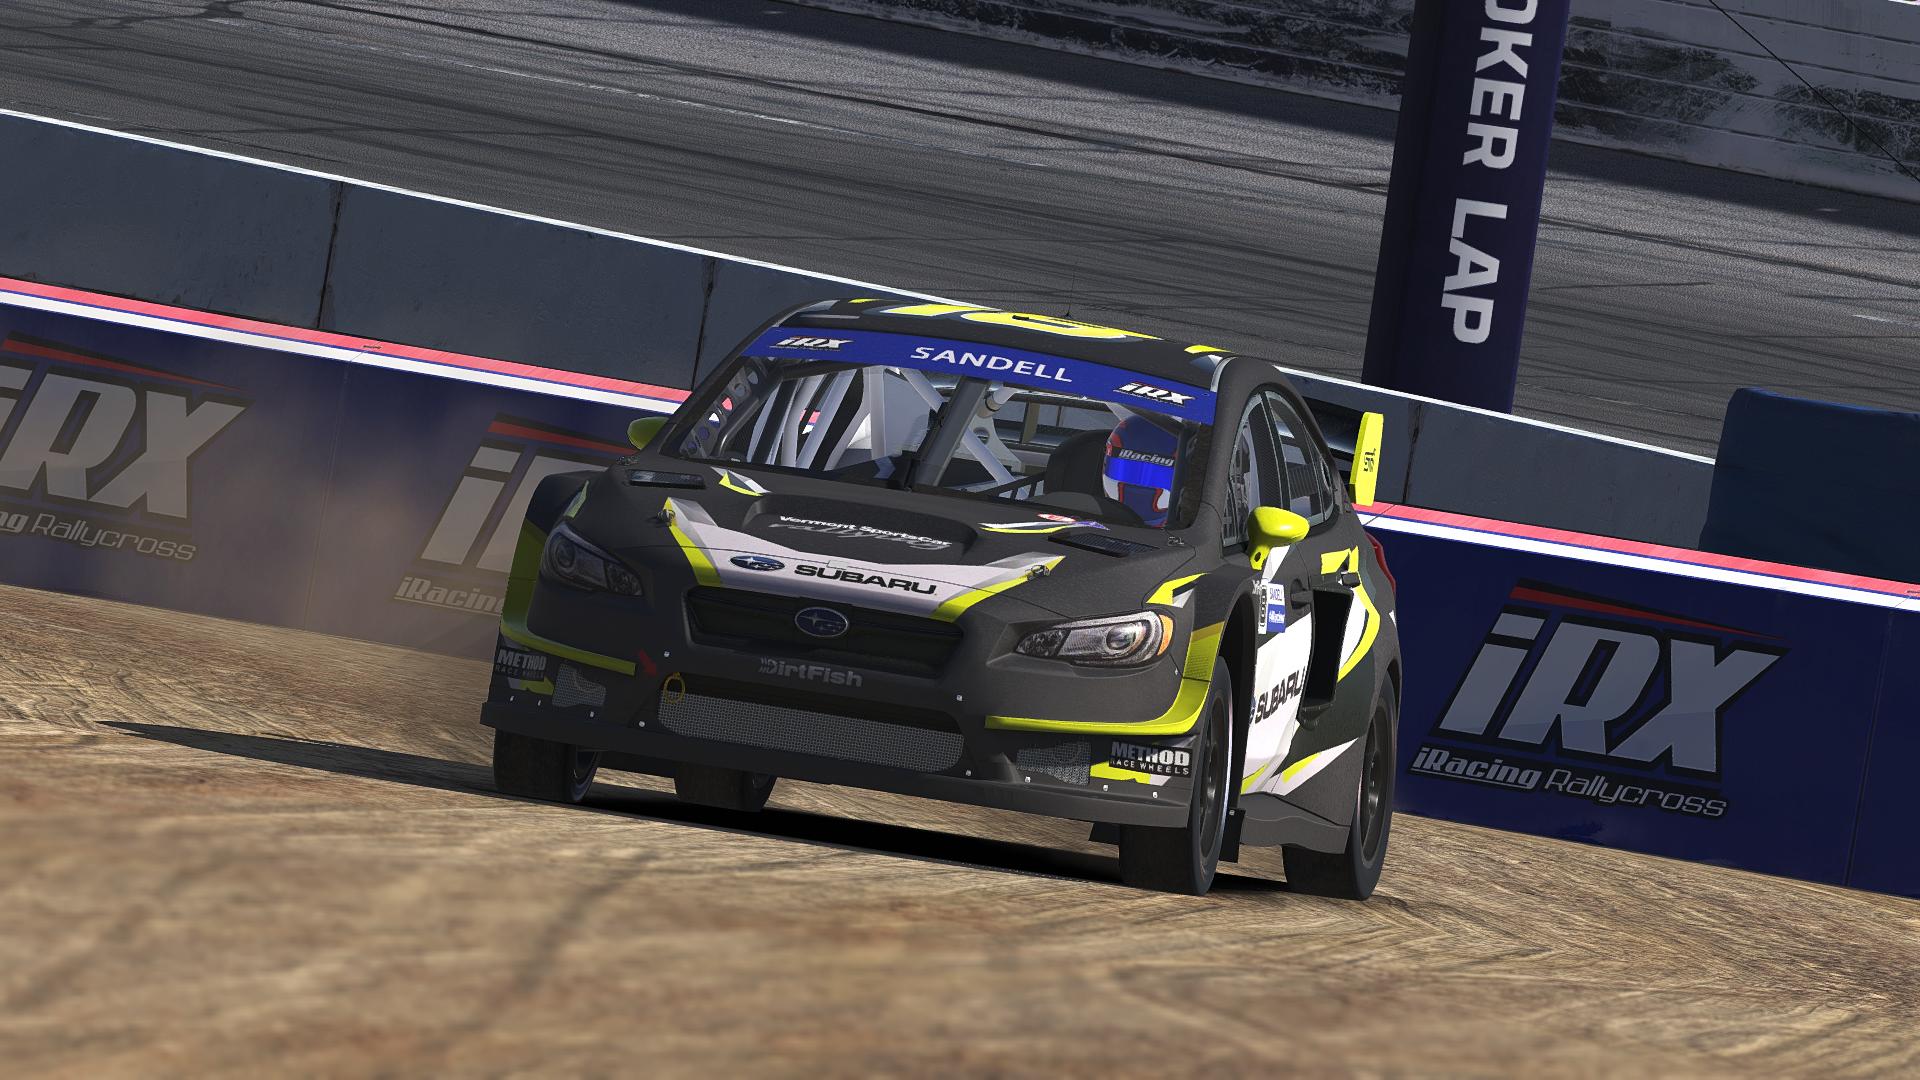 Subaru WRX STI - iRacing com | iRacing com Motorsport